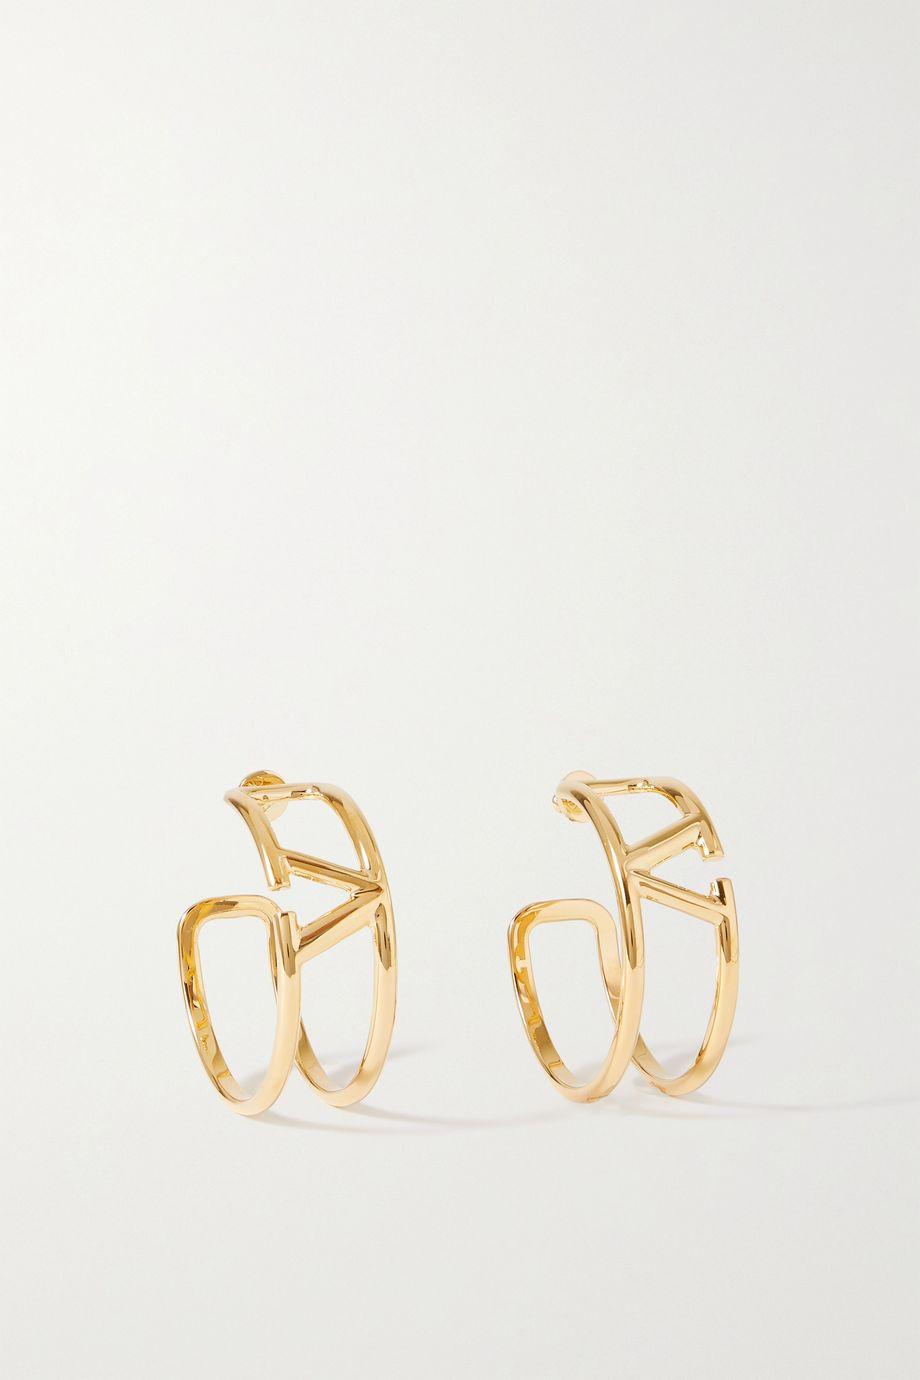 Valentino Boucles d'oreilles dorées Valentino Garavani